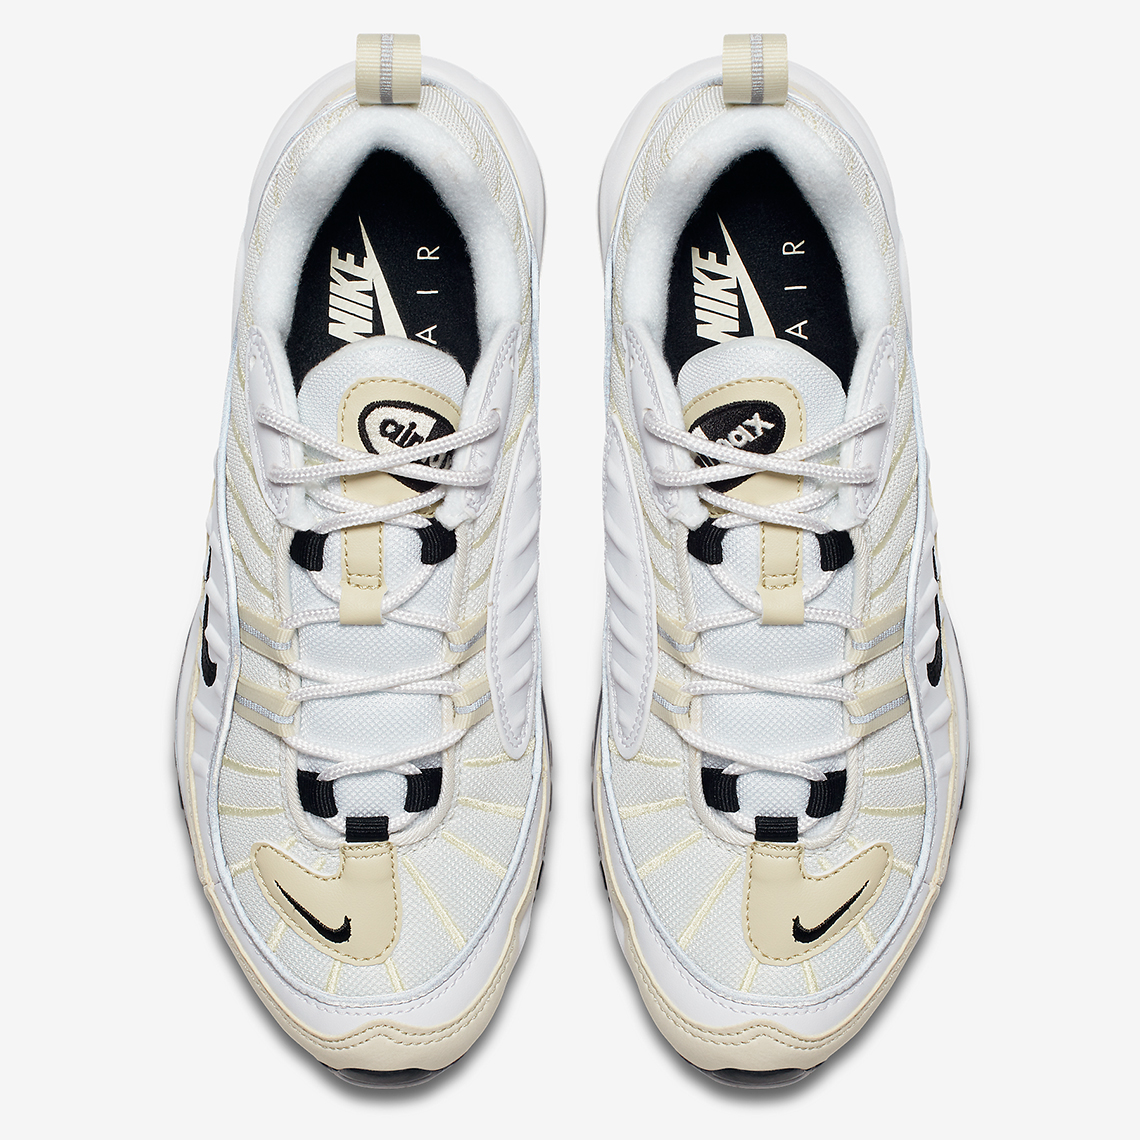 Nike Air Max 98 Para Mujer Blancos Triples LFxTeO1